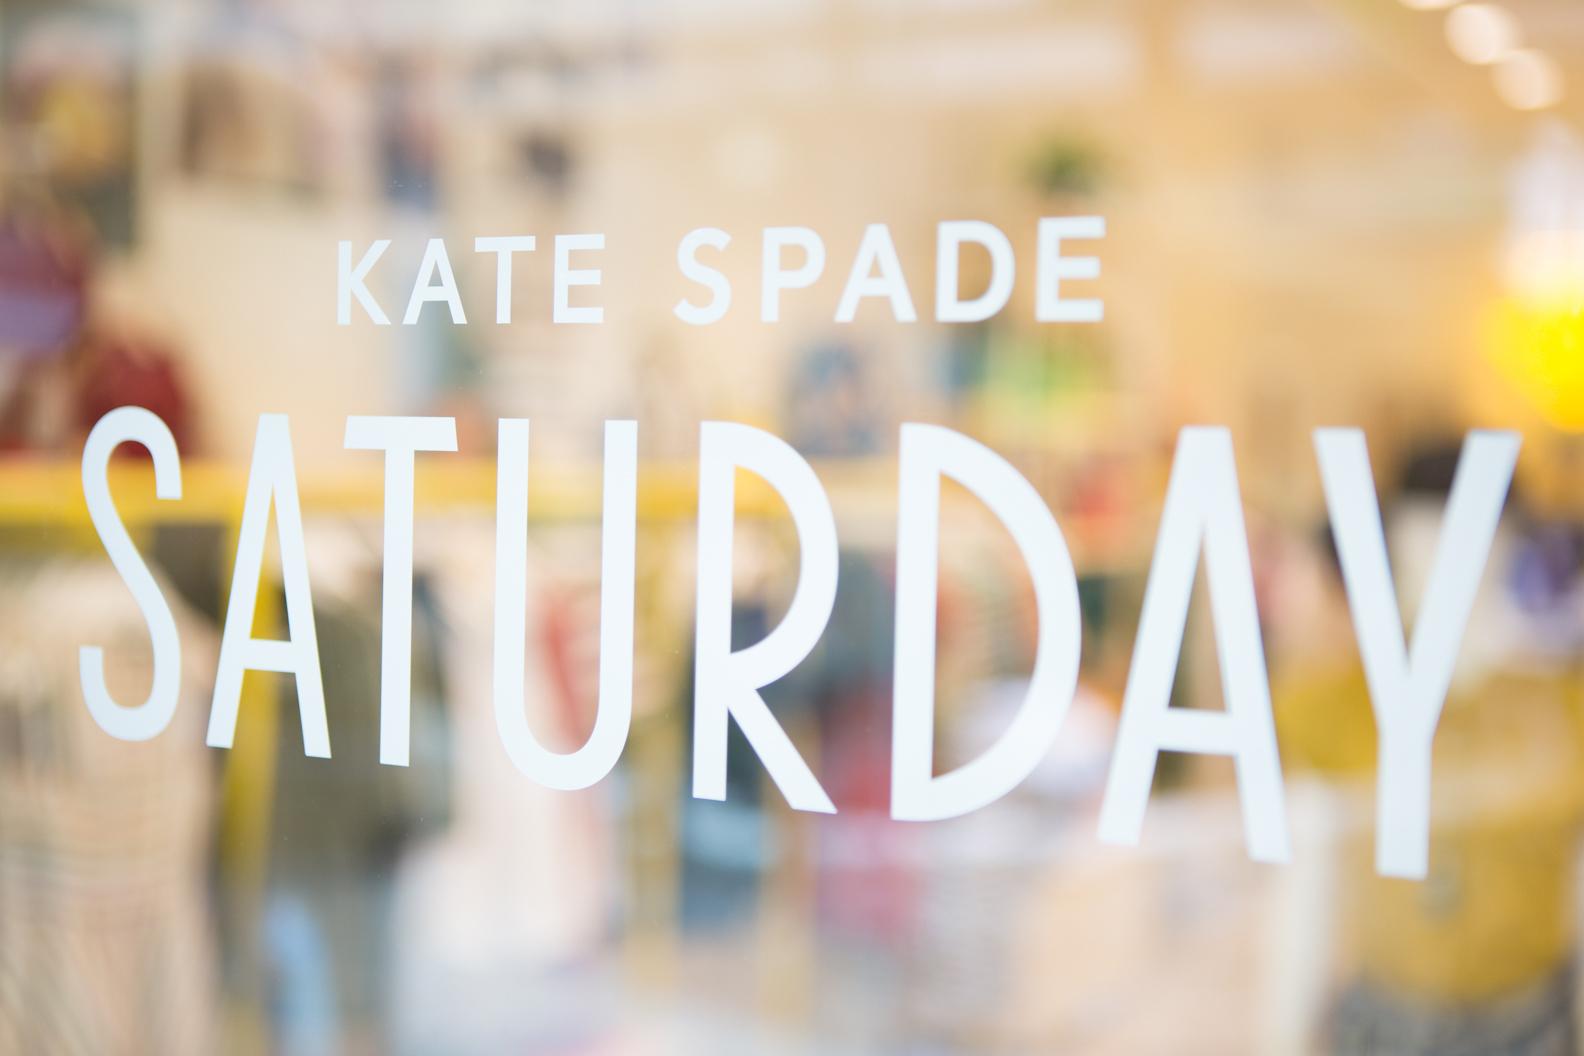 Photos courtesy of Kate Spade Saturday